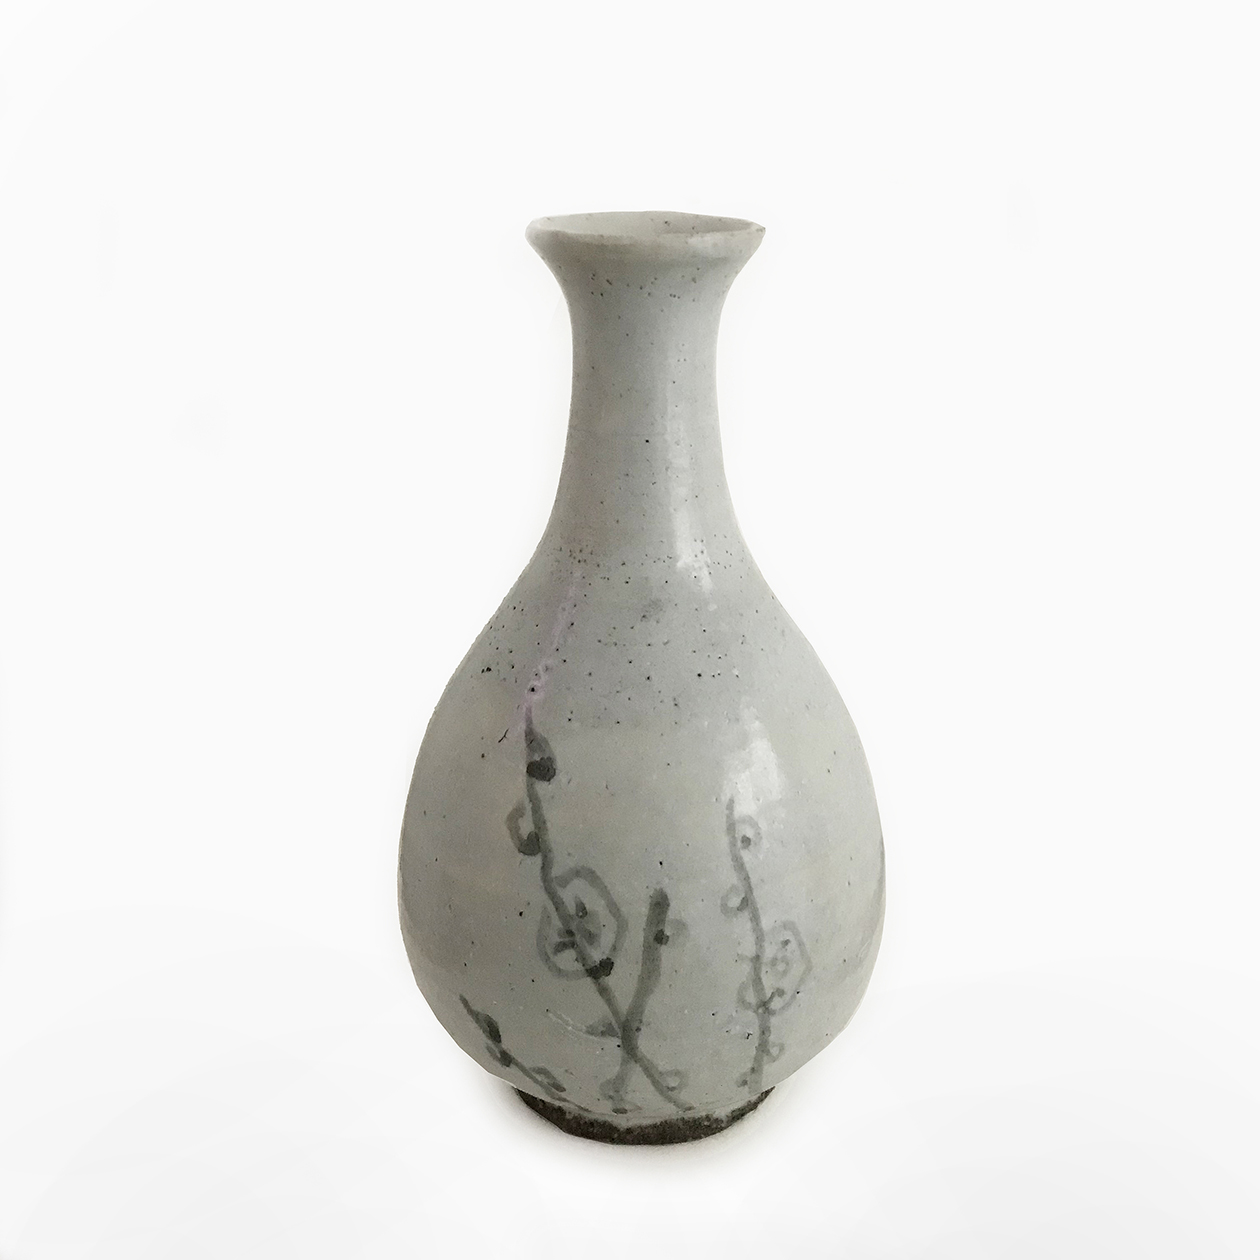 Bottle Vase_ceramic_ Joseon Dynasty_Korea_basedonart gallery